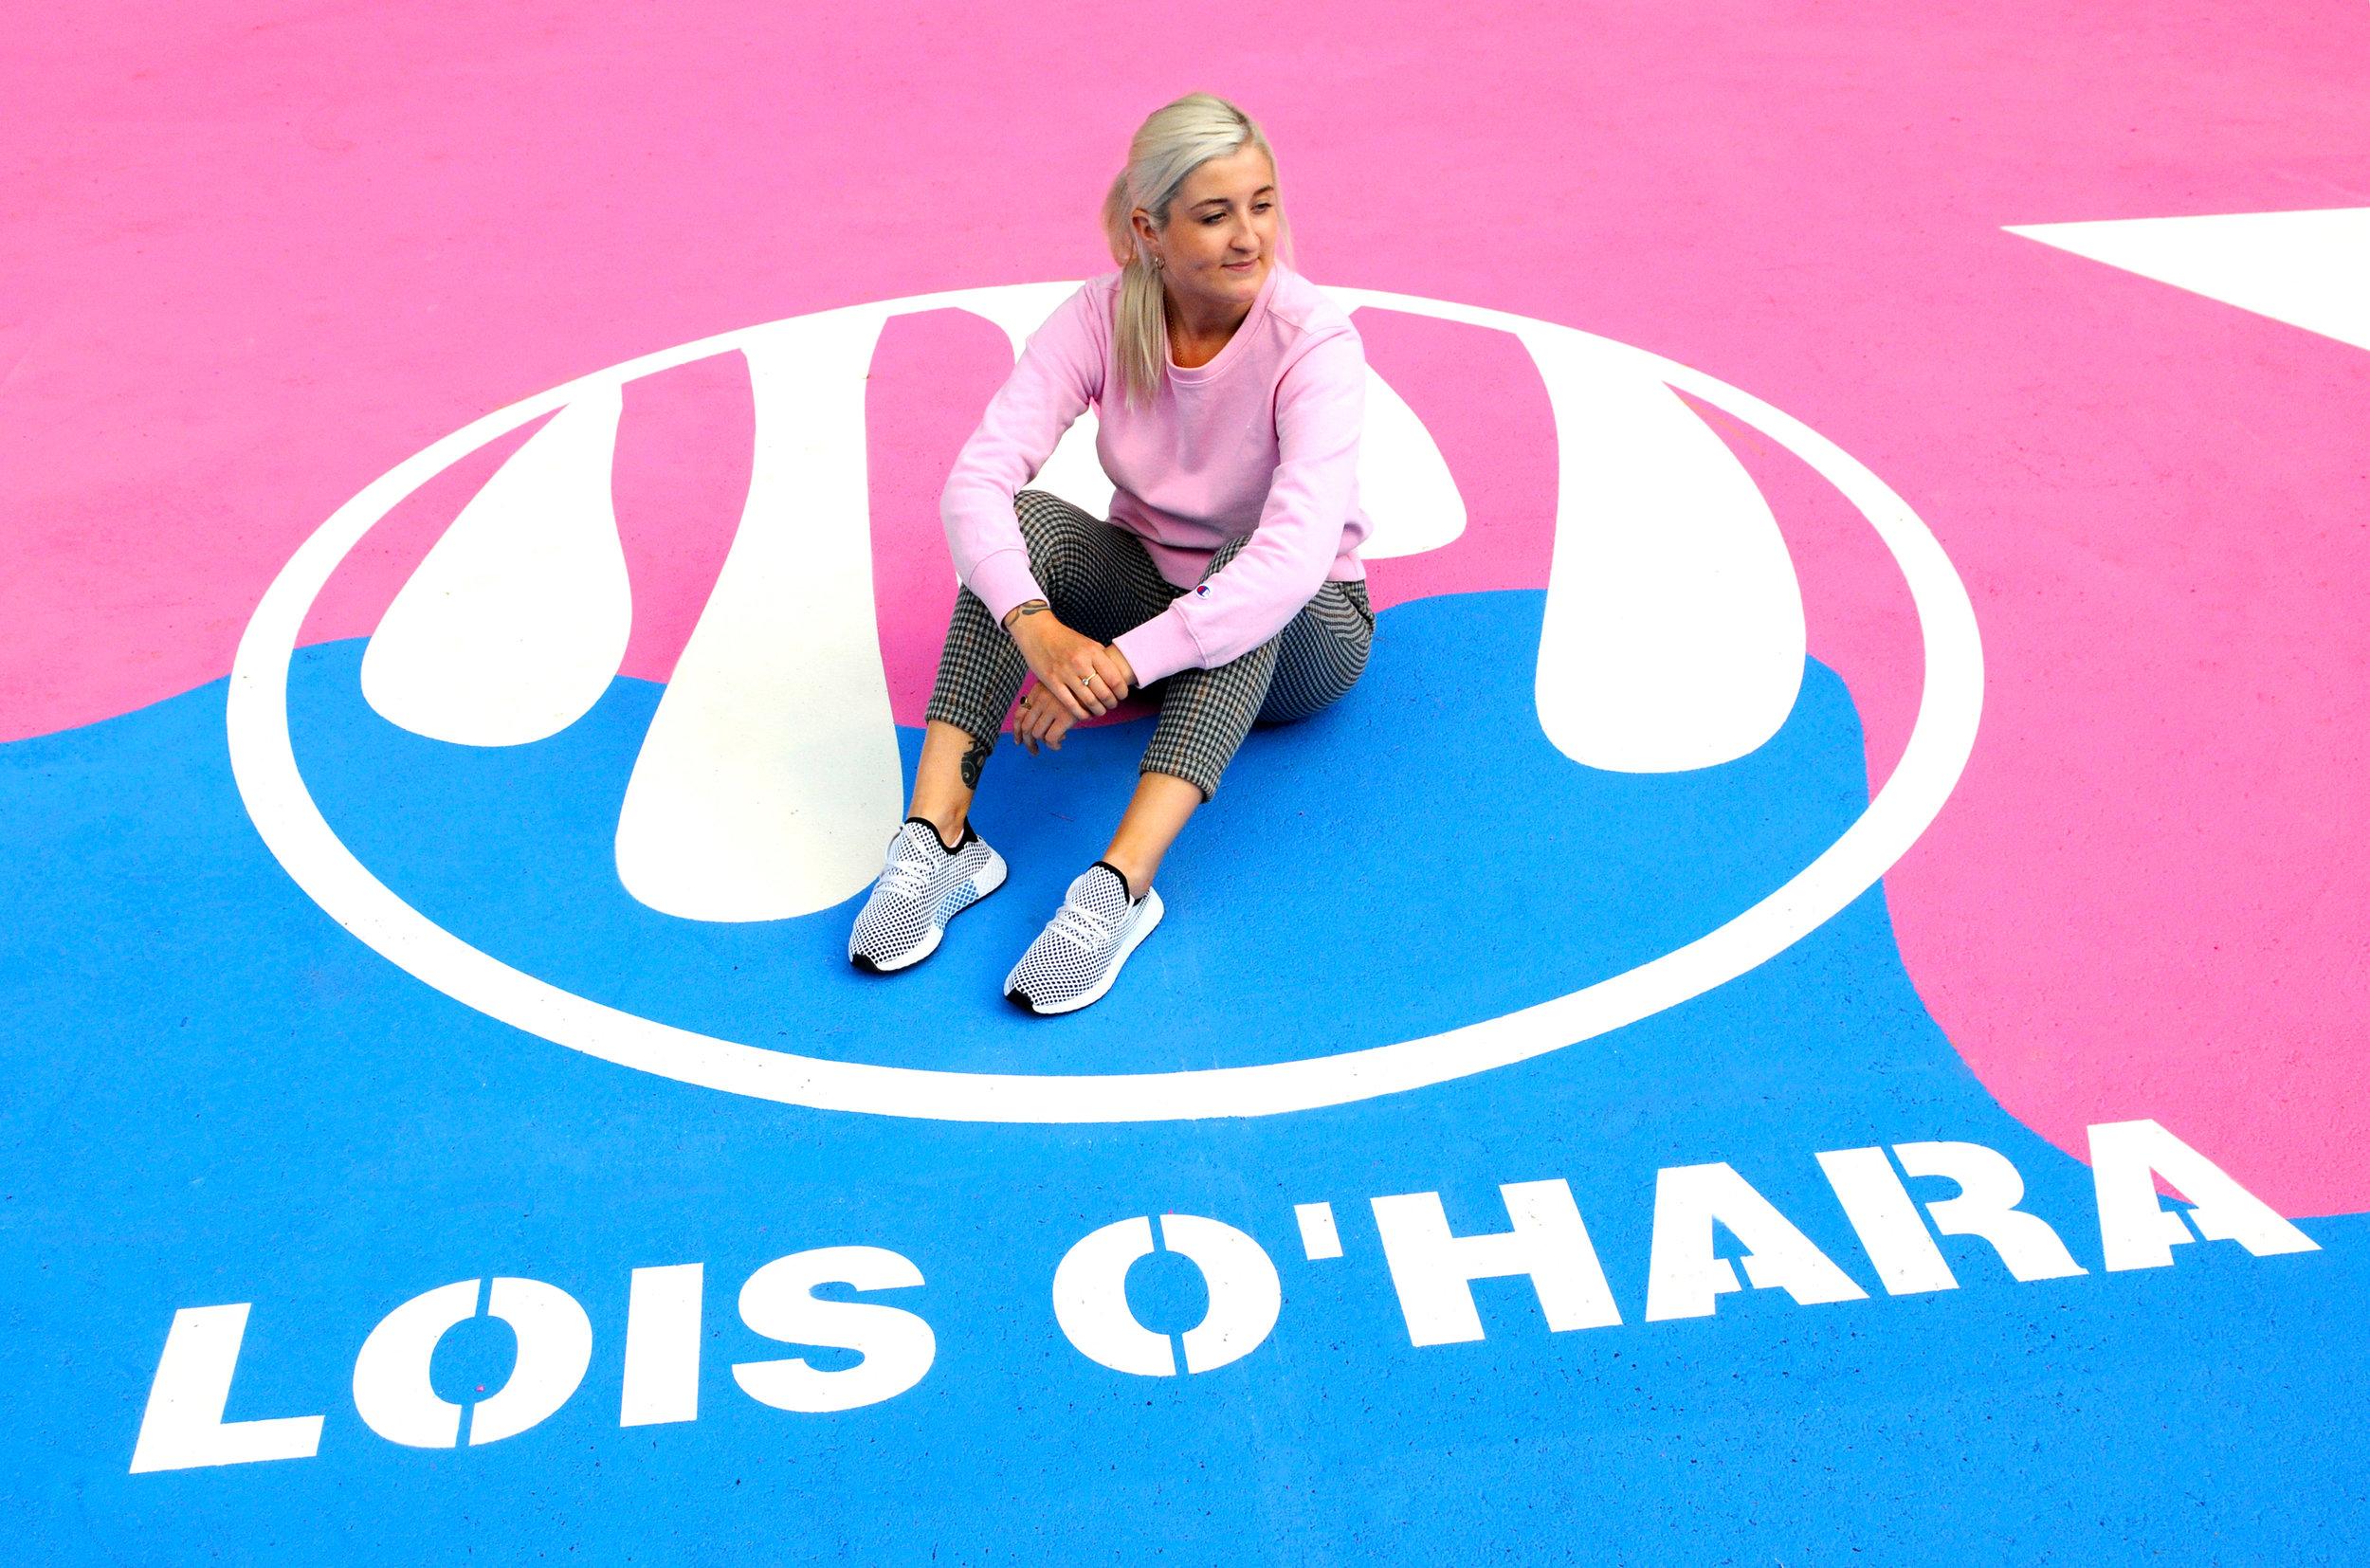 Lois-O-Hara-Basketball-Court-Brighton-PhotoCredit-BabyPictureThis.jpg